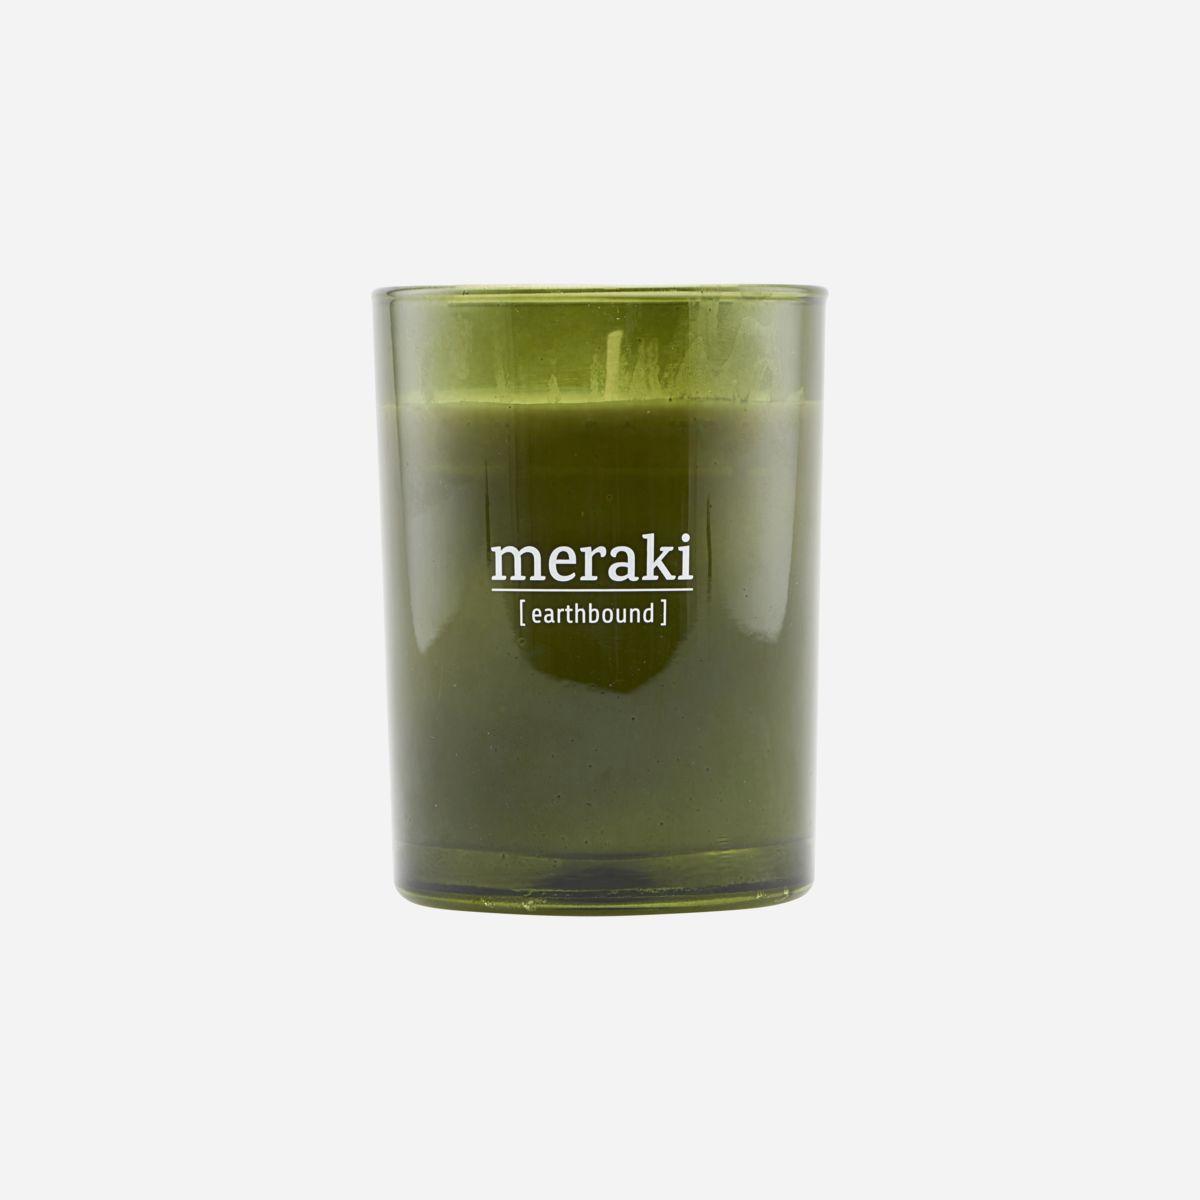 Meraki - Duftlys, earthbound, 120g